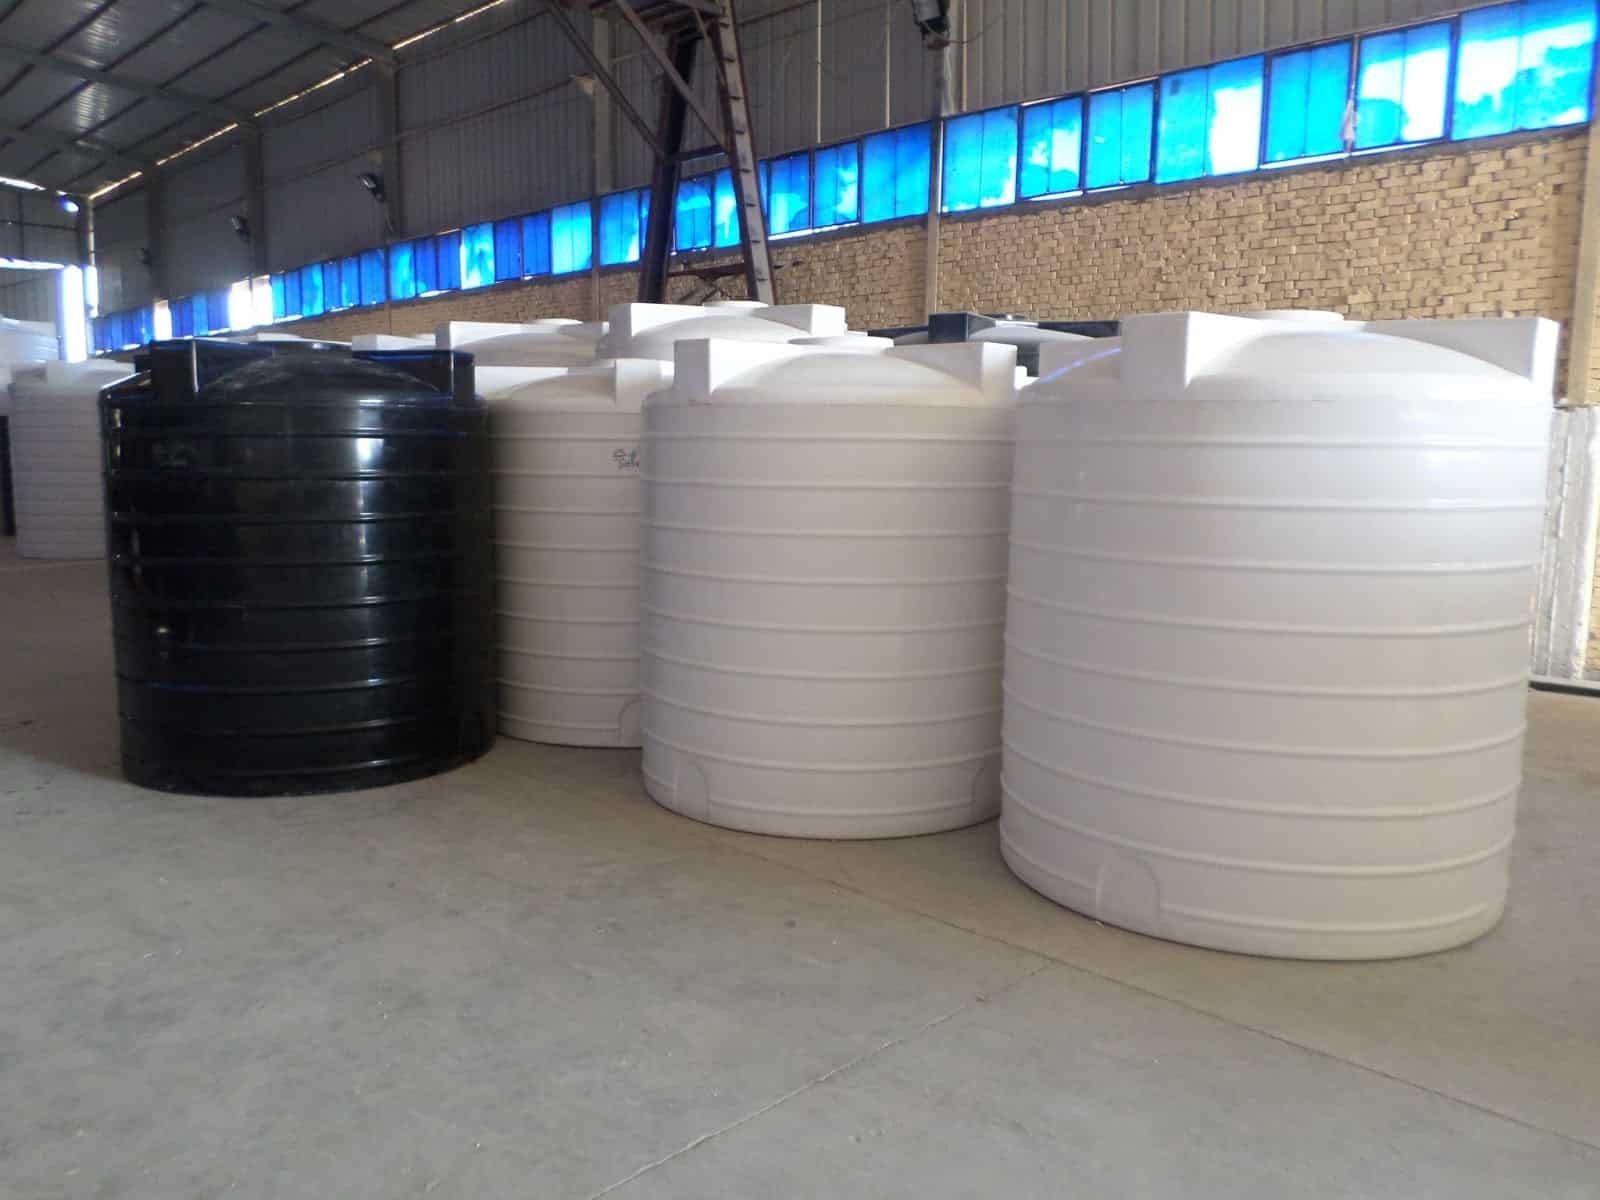 خزانات مياه الشرب1 - غسيل خزانات مياه الشرب مع التعقيم والتطهير